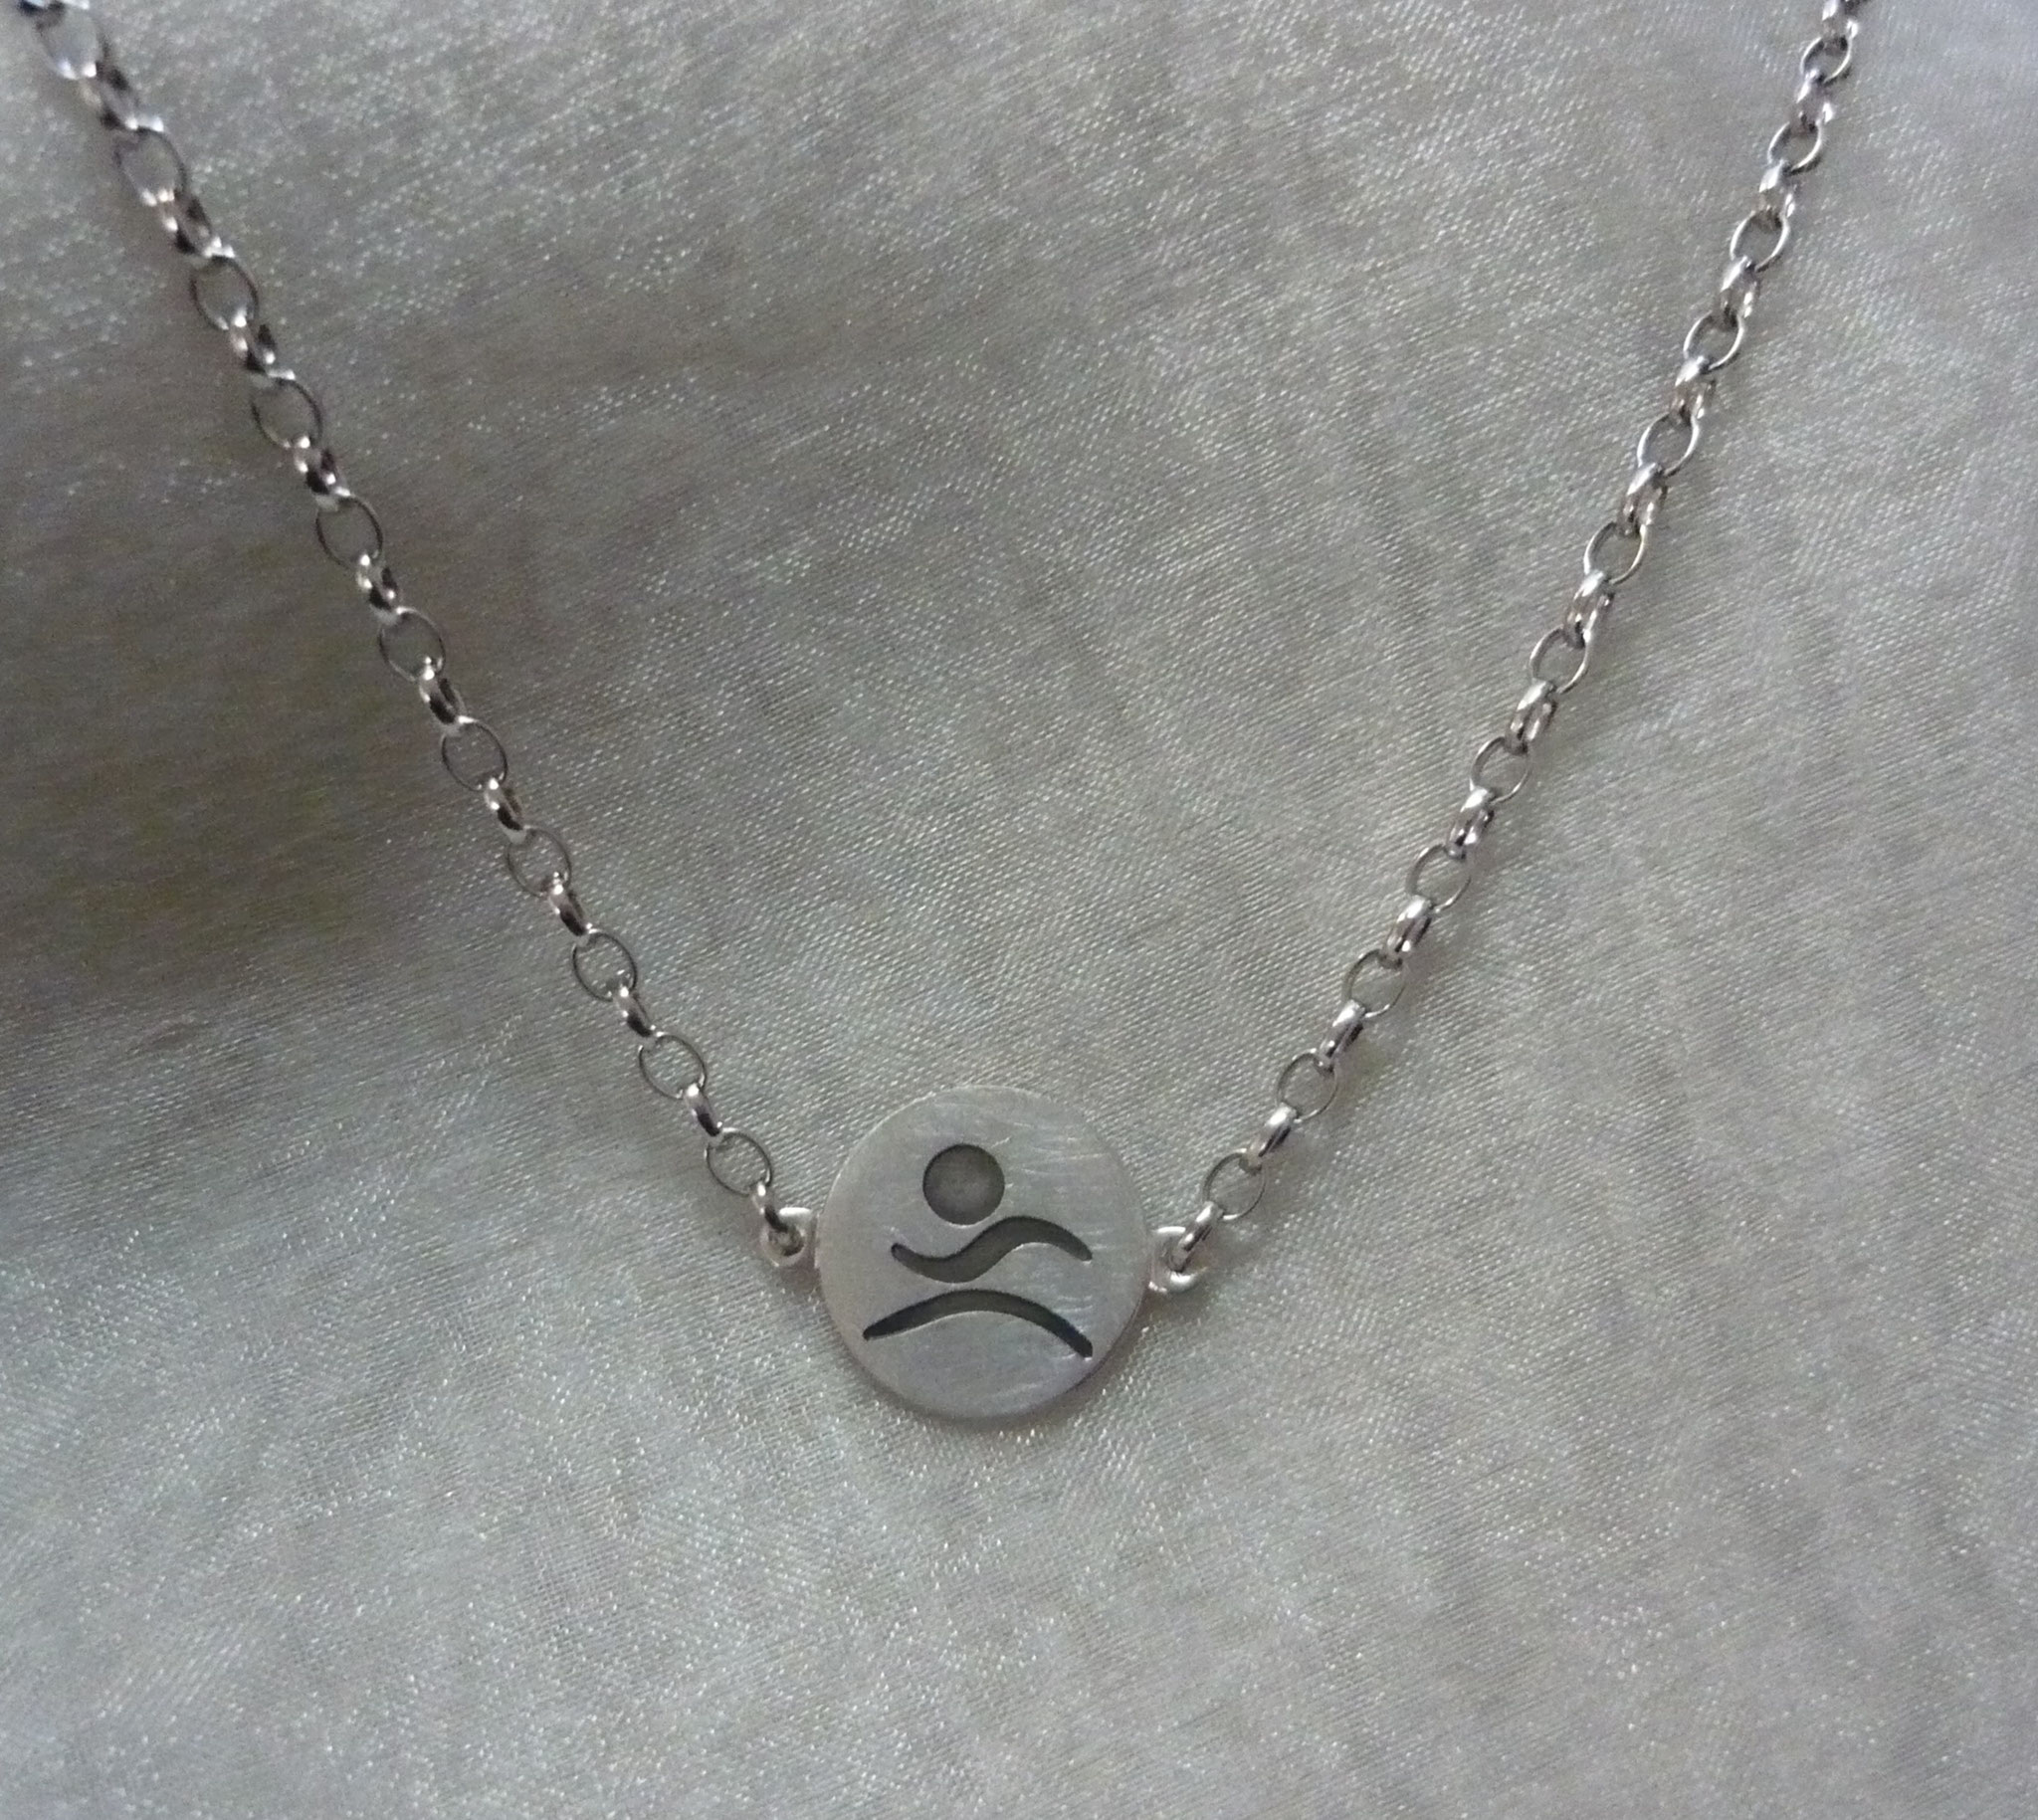 Florianer-Collier 925/000 Sterling-Silber € 115,-